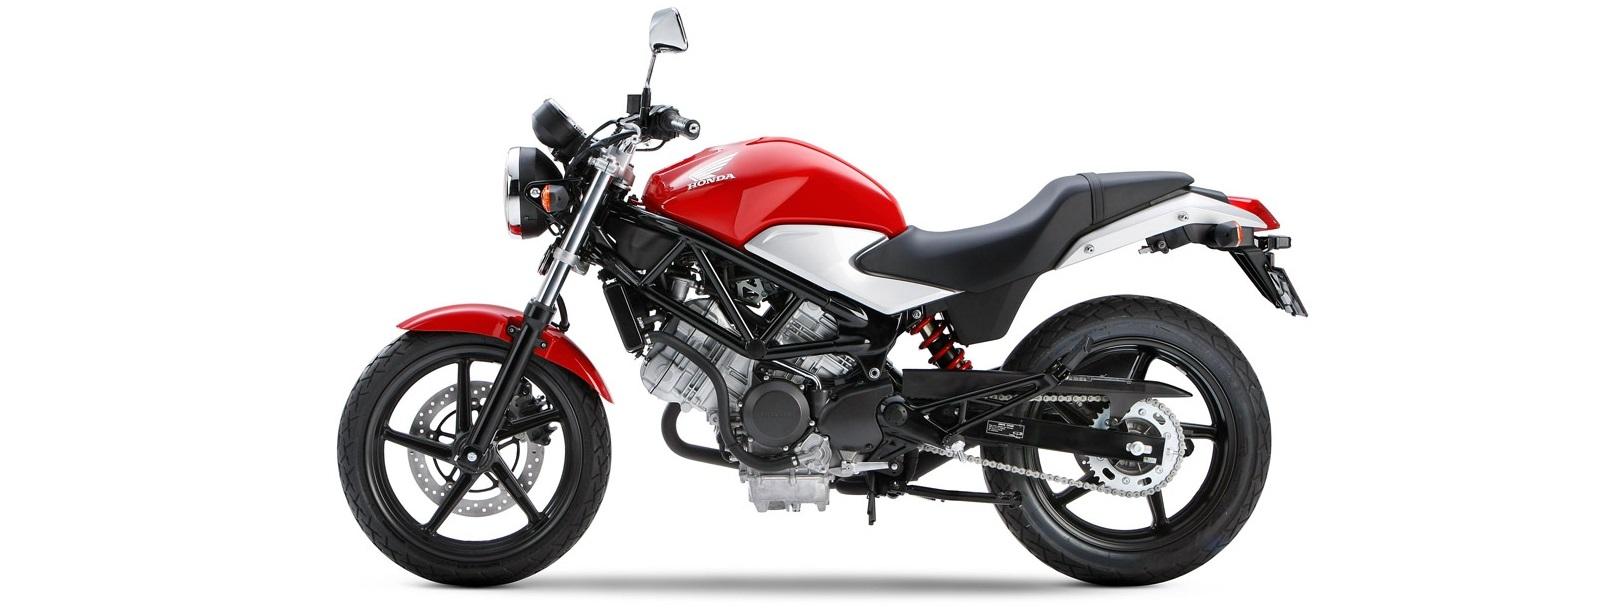 Moto del día: Honda VTR 250